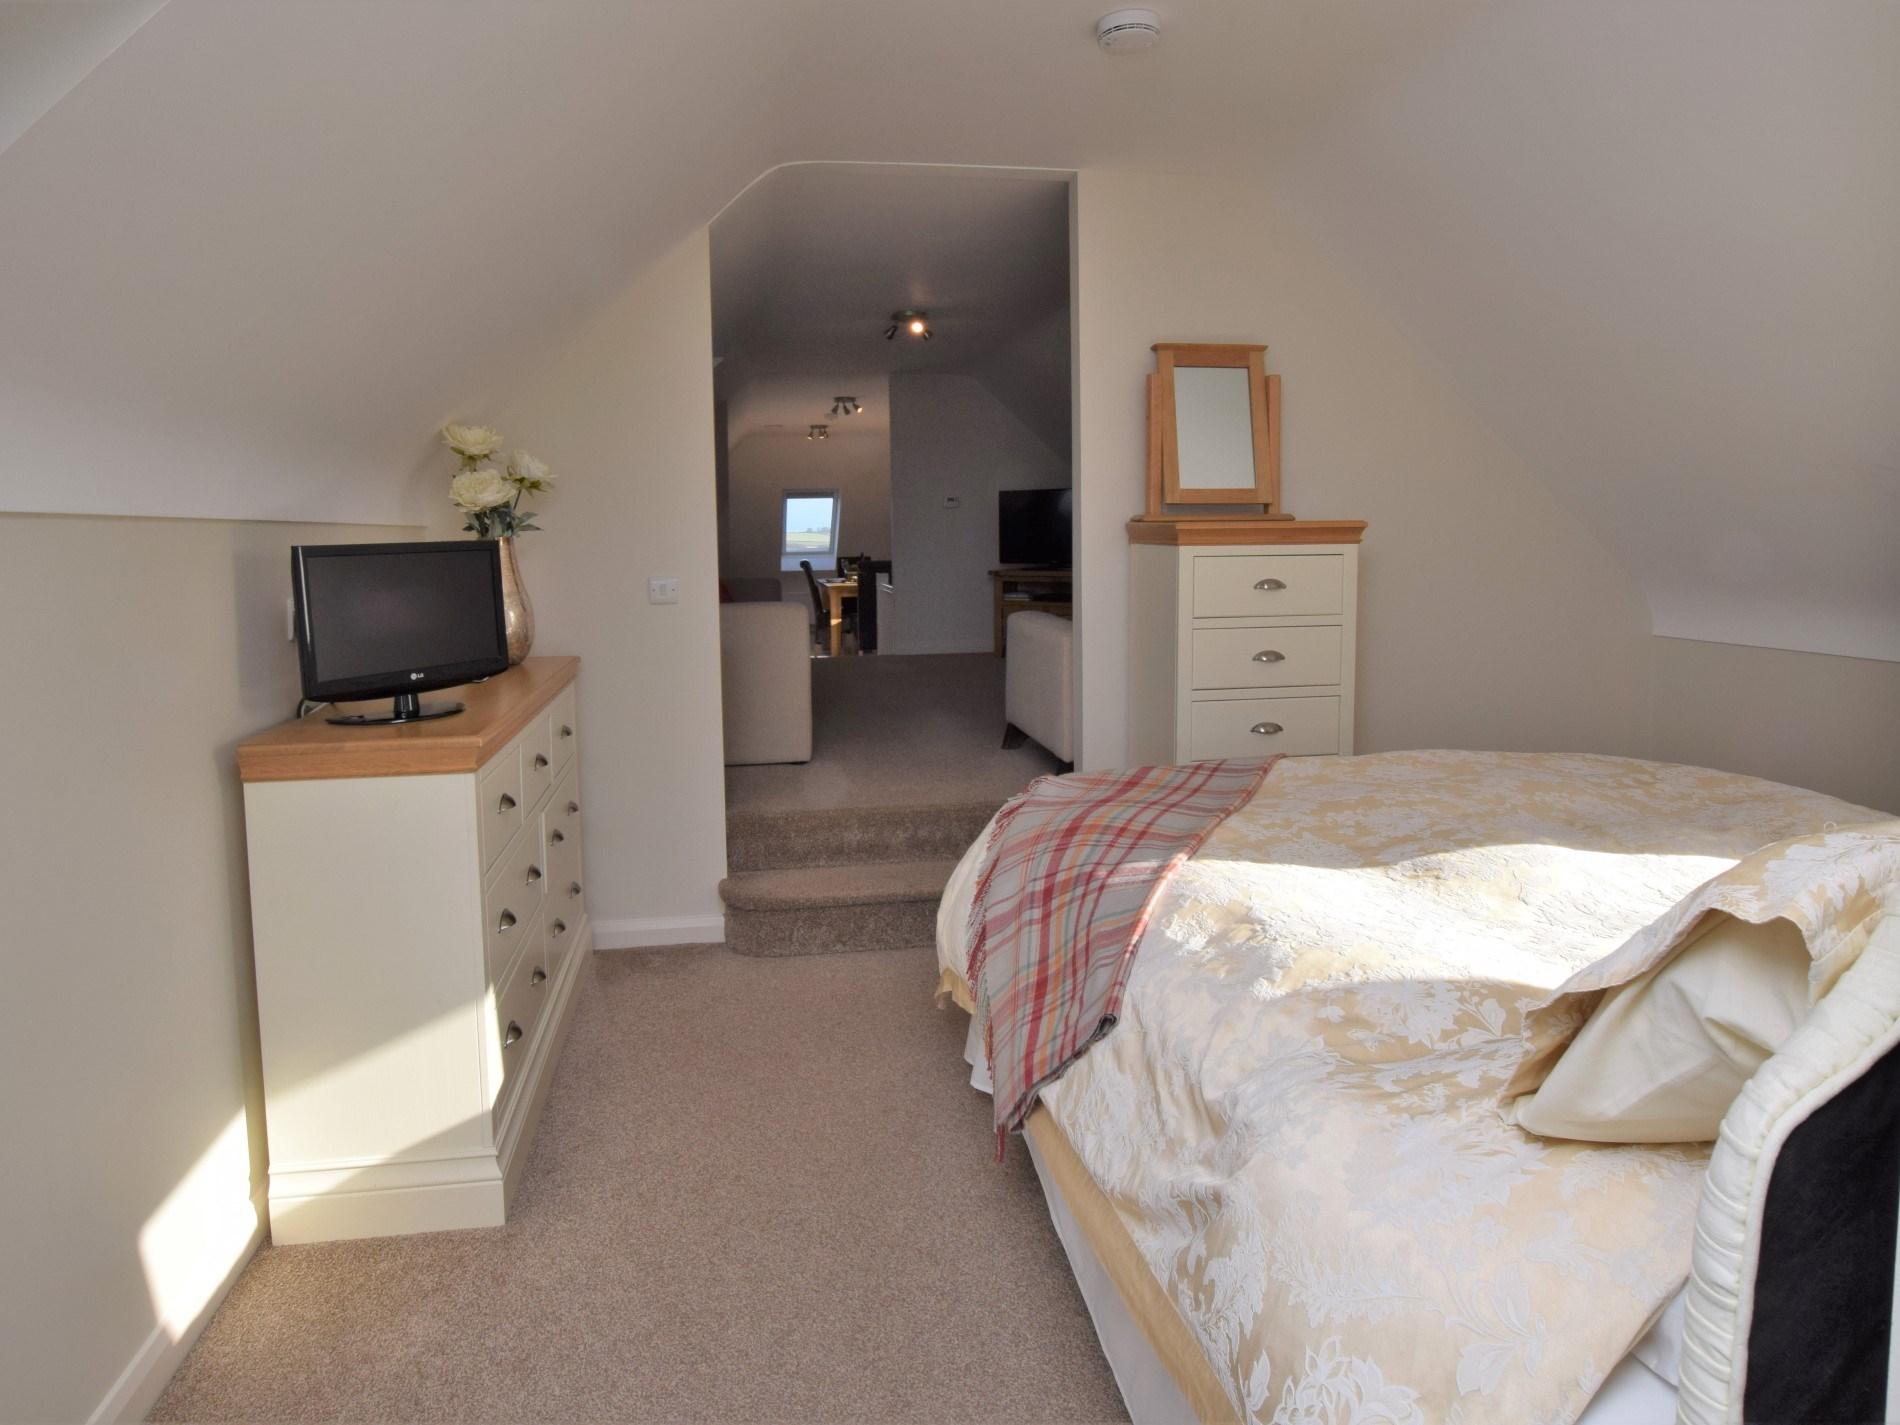 1 Bedroom Cottage in Blandford Forum, Dorset and Somerset